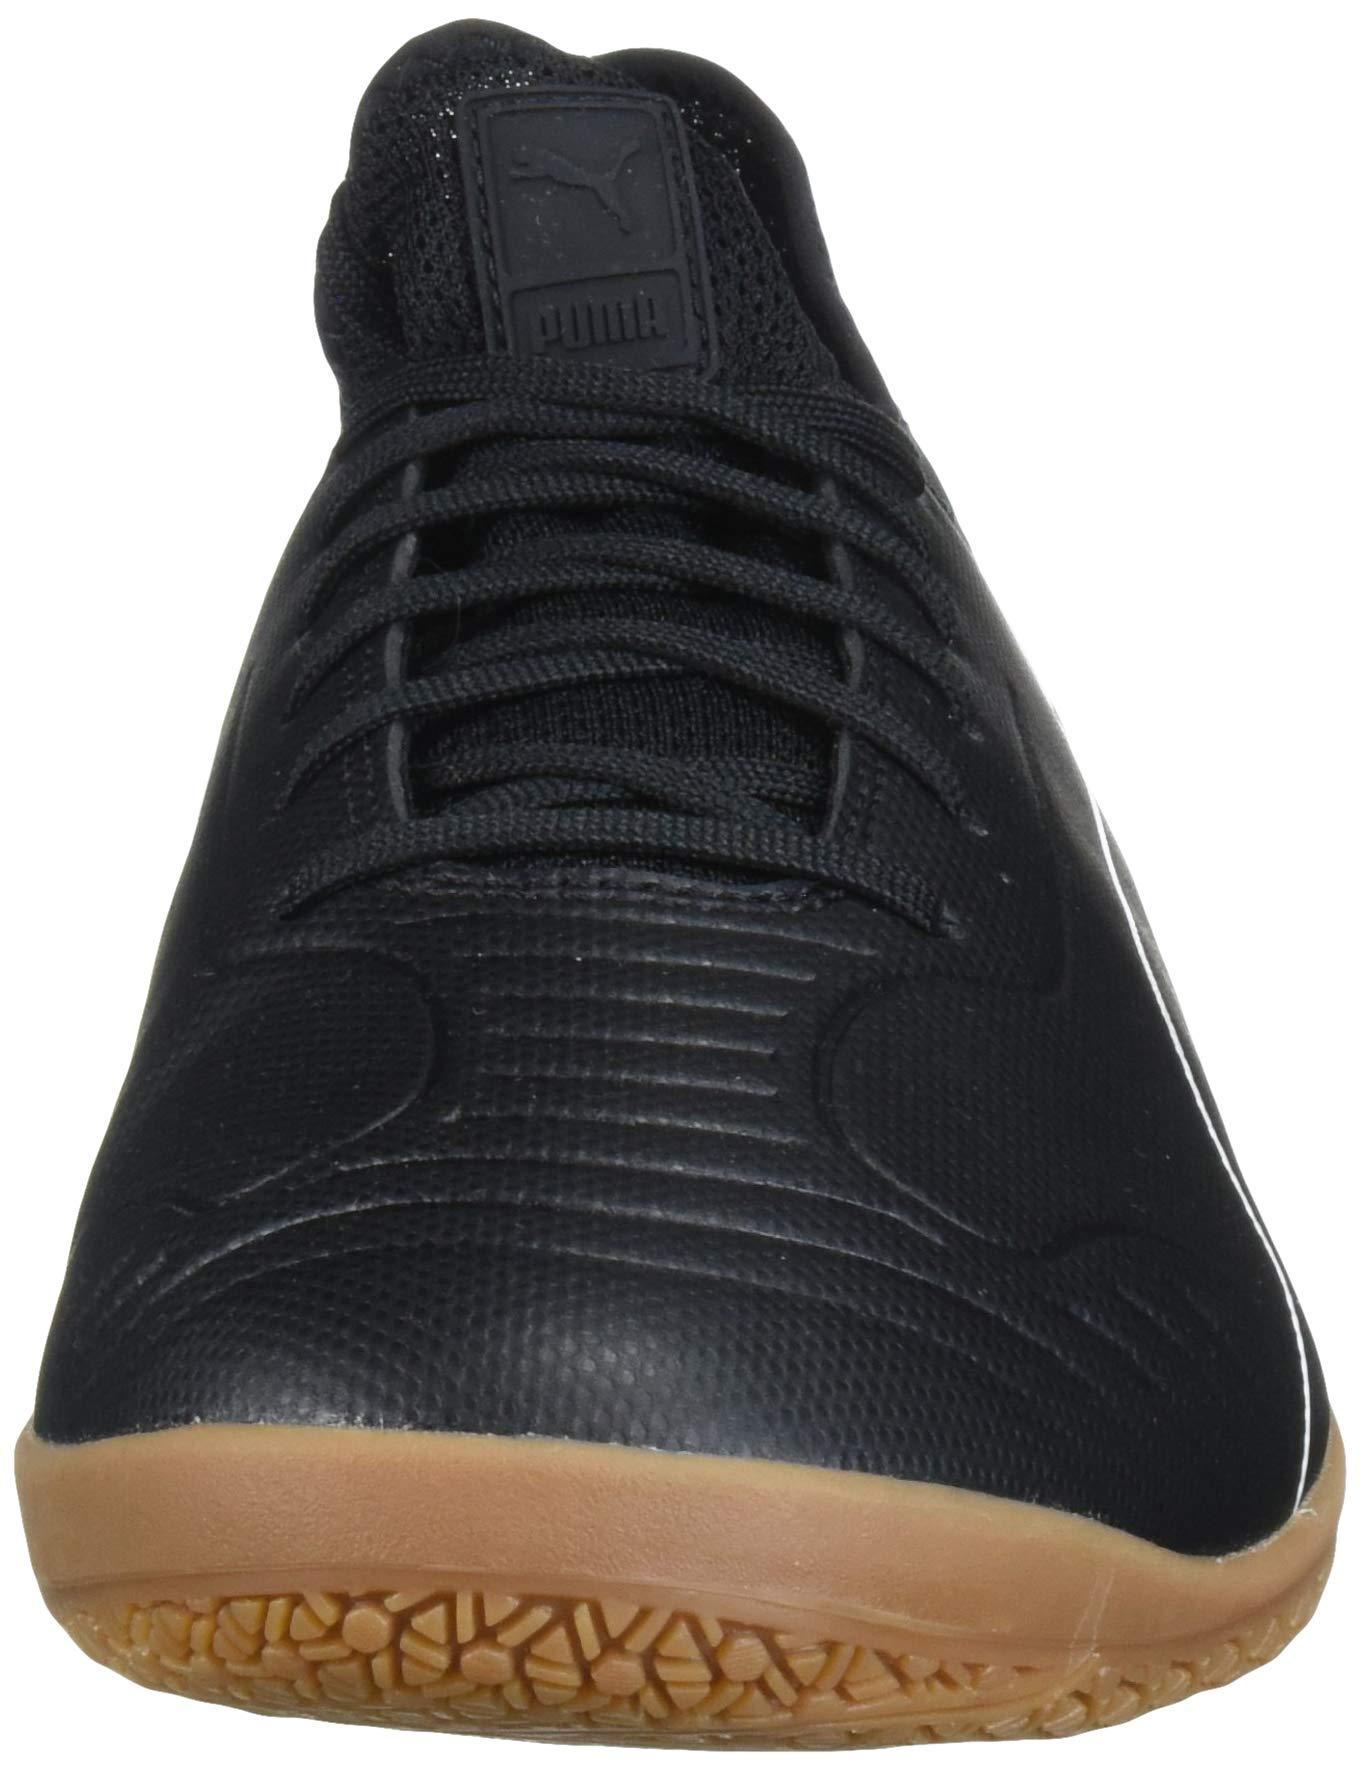 PUMA-Men-039-s-365-Sala-2-Sneaker-Color-01-PUMA-BLACK-PUMA-WHITE-GUM thumbnail 5